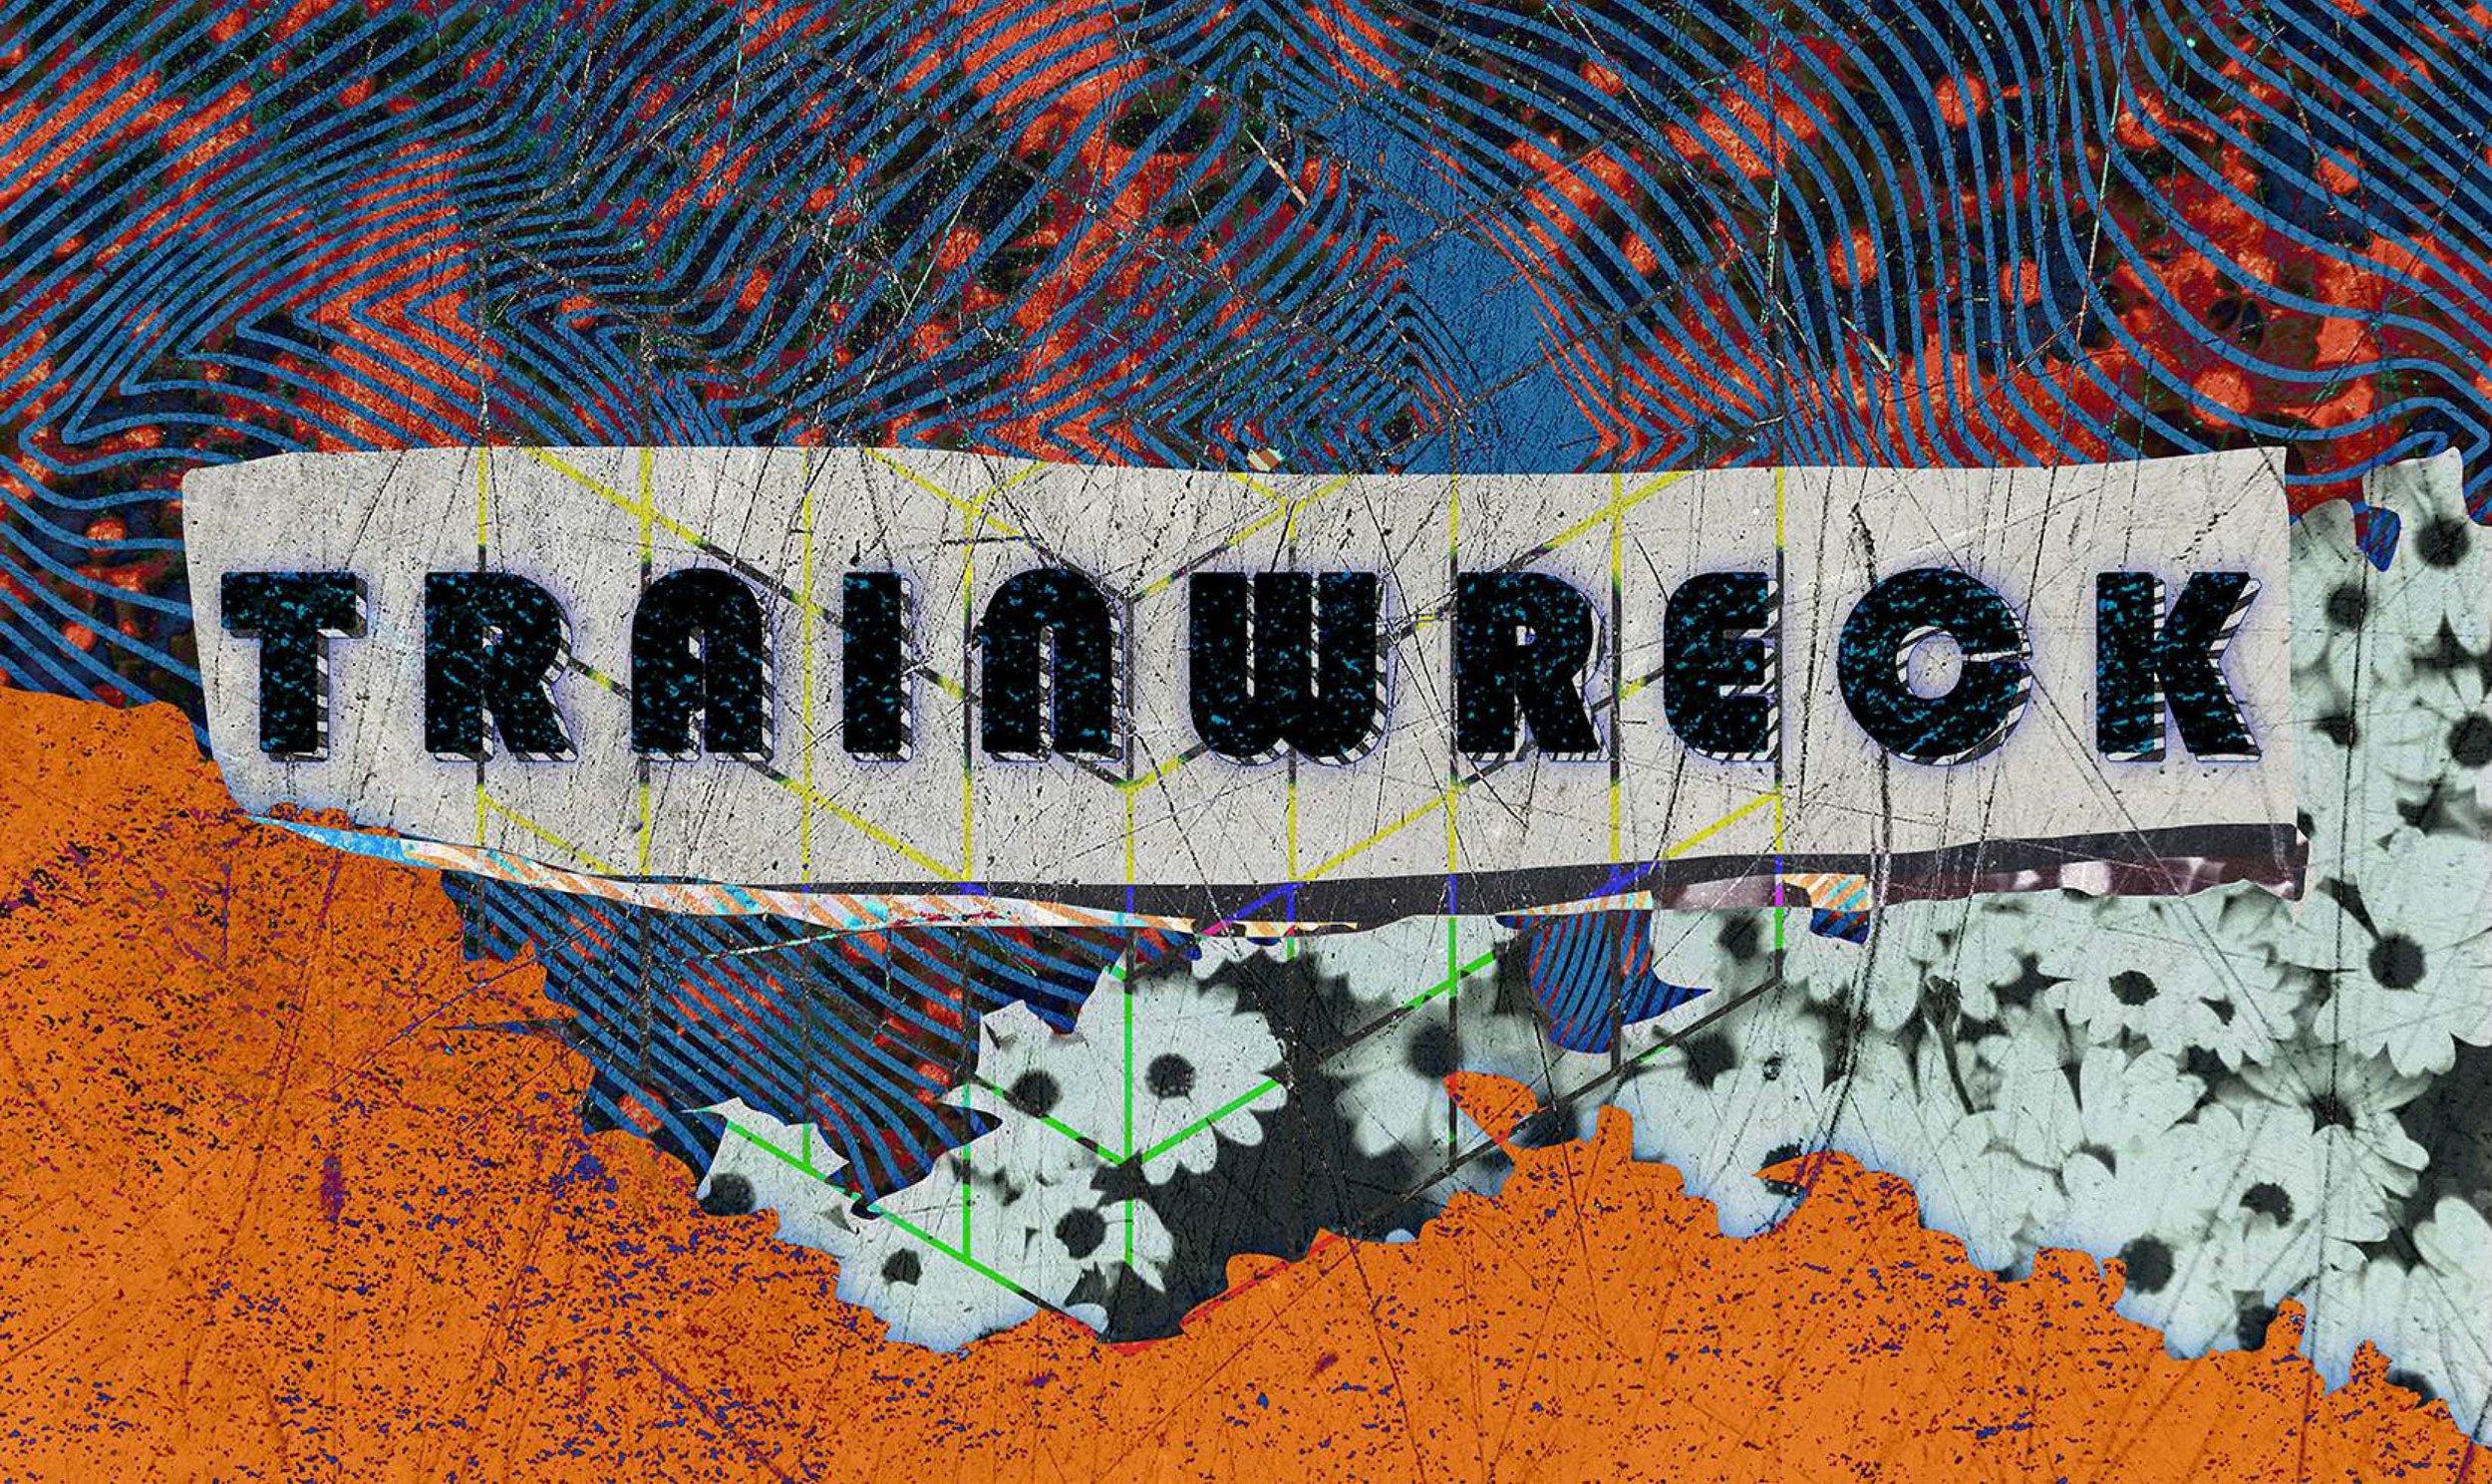 Trainwreck2a.jpg